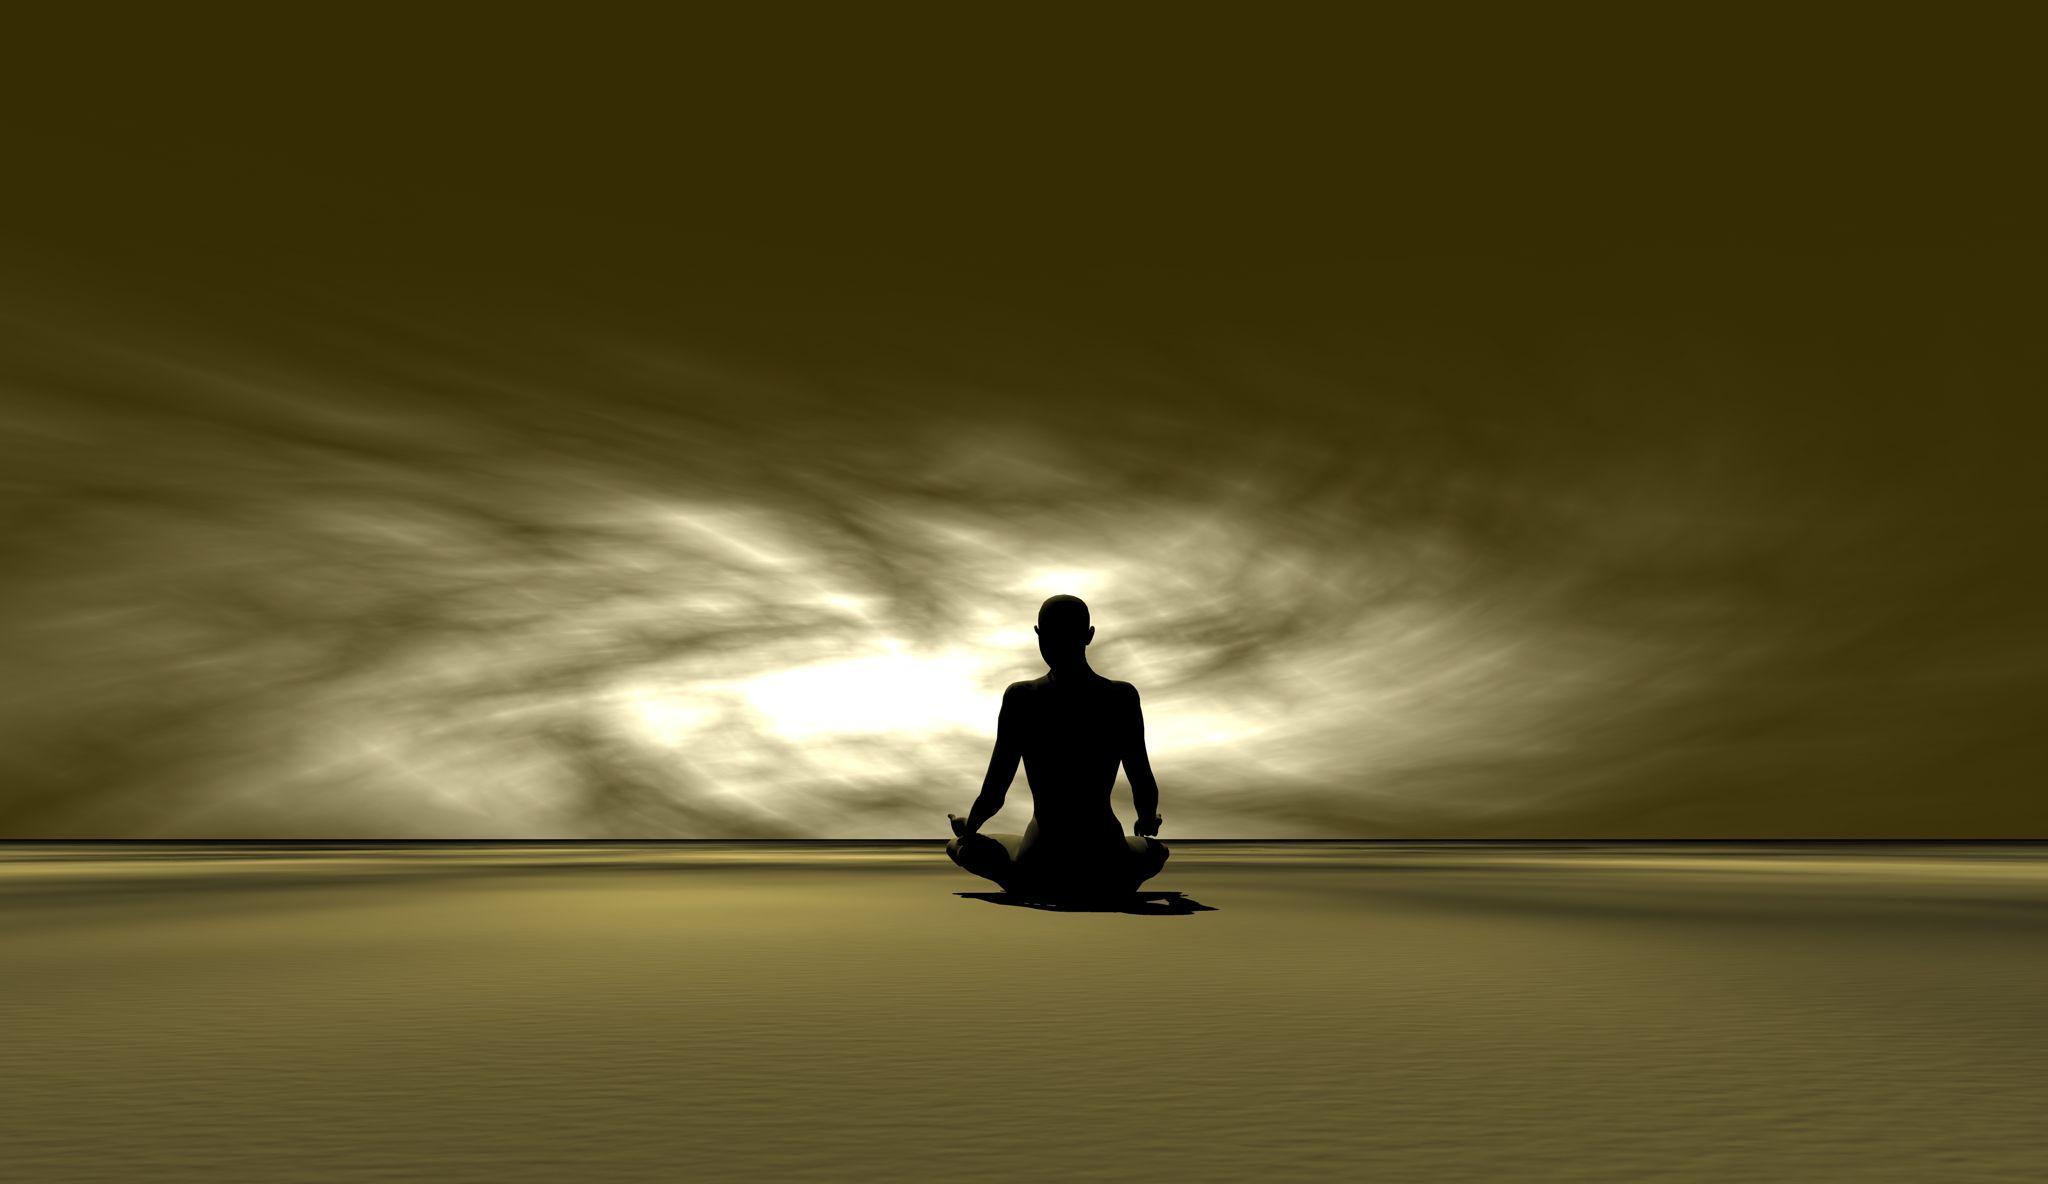 Meditation Yoga Wallpapers Top Free Meditation Yoga Backgrounds Wallpaperaccess